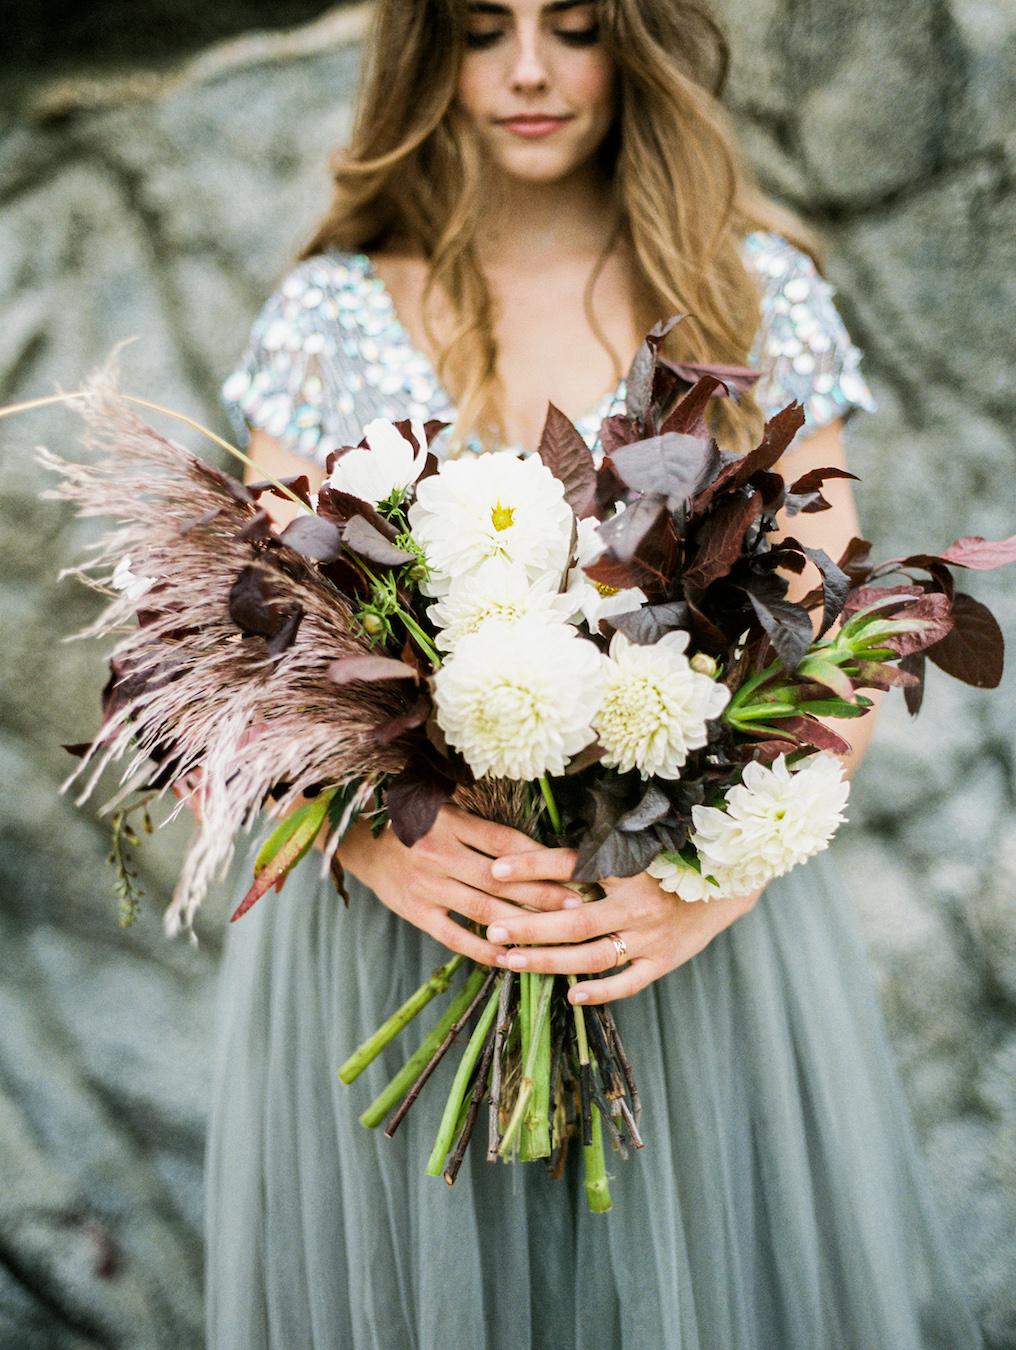 natalie-papova-wedding-stylist-24.jpg